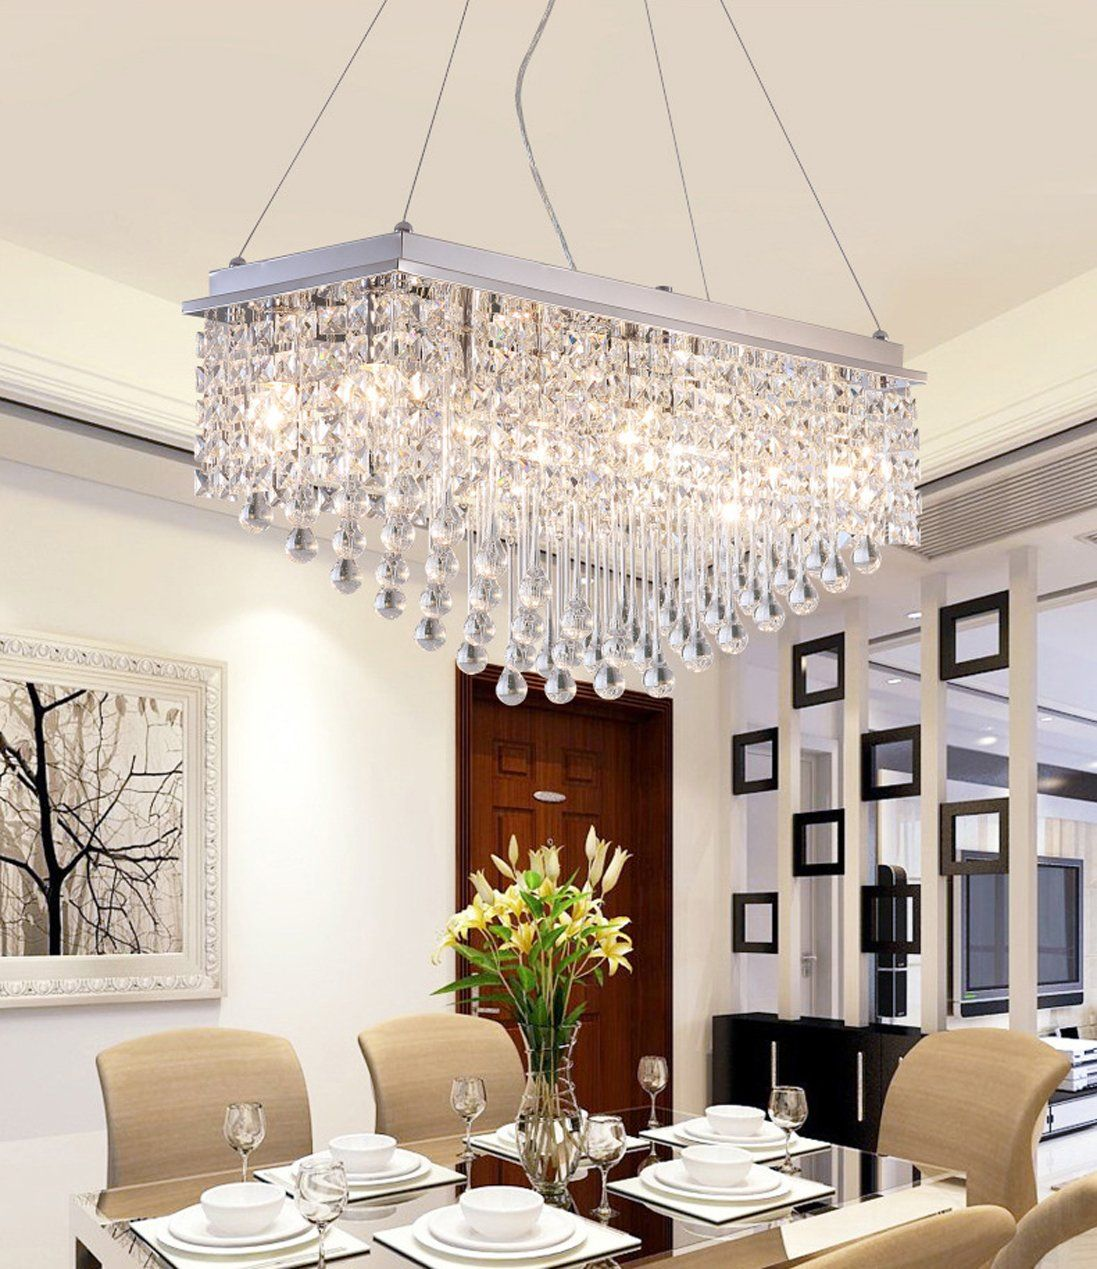 Modern K9 Crystal Raindrop Chandelier Lighting Flush Mount Led